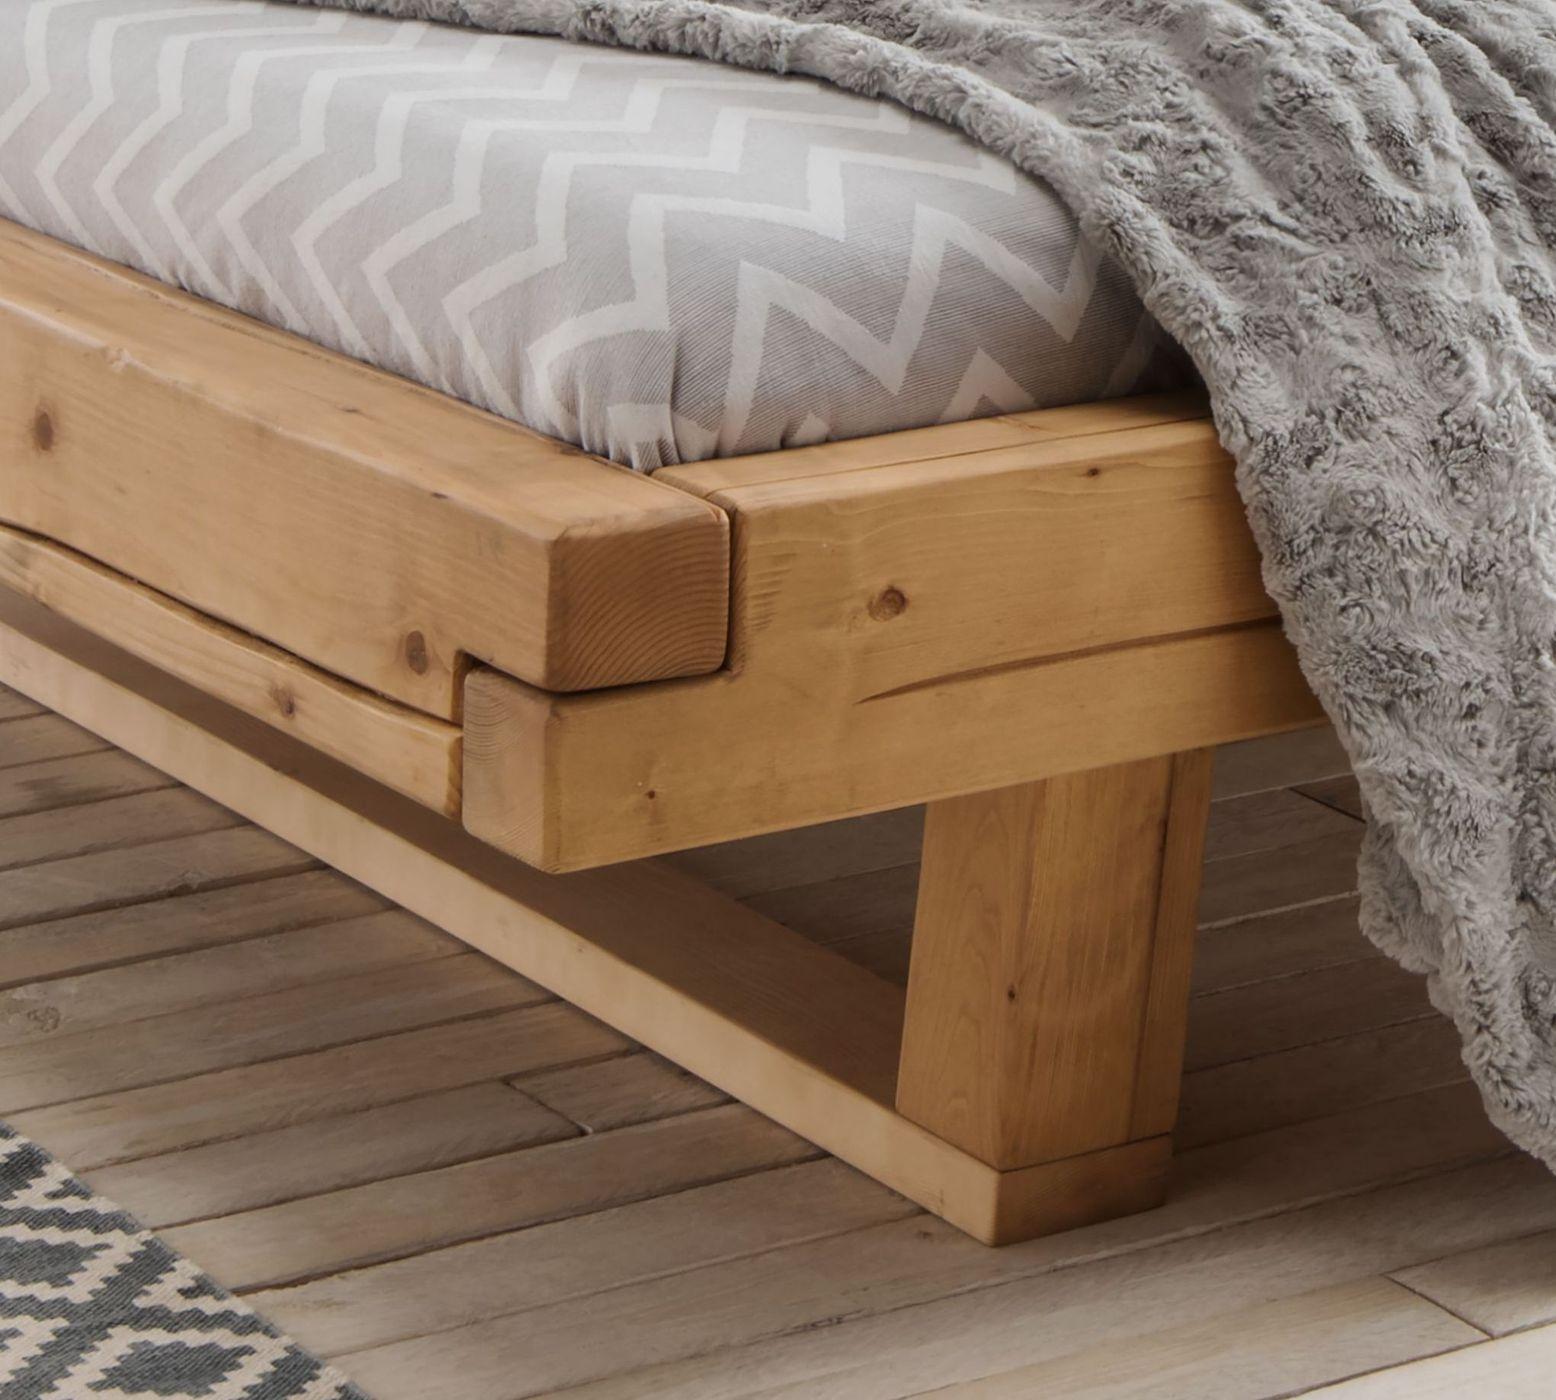 balkenbett aus fichtenholz natur ge lt bis 200 kg basiliano. Black Bedroom Furniture Sets. Home Design Ideas